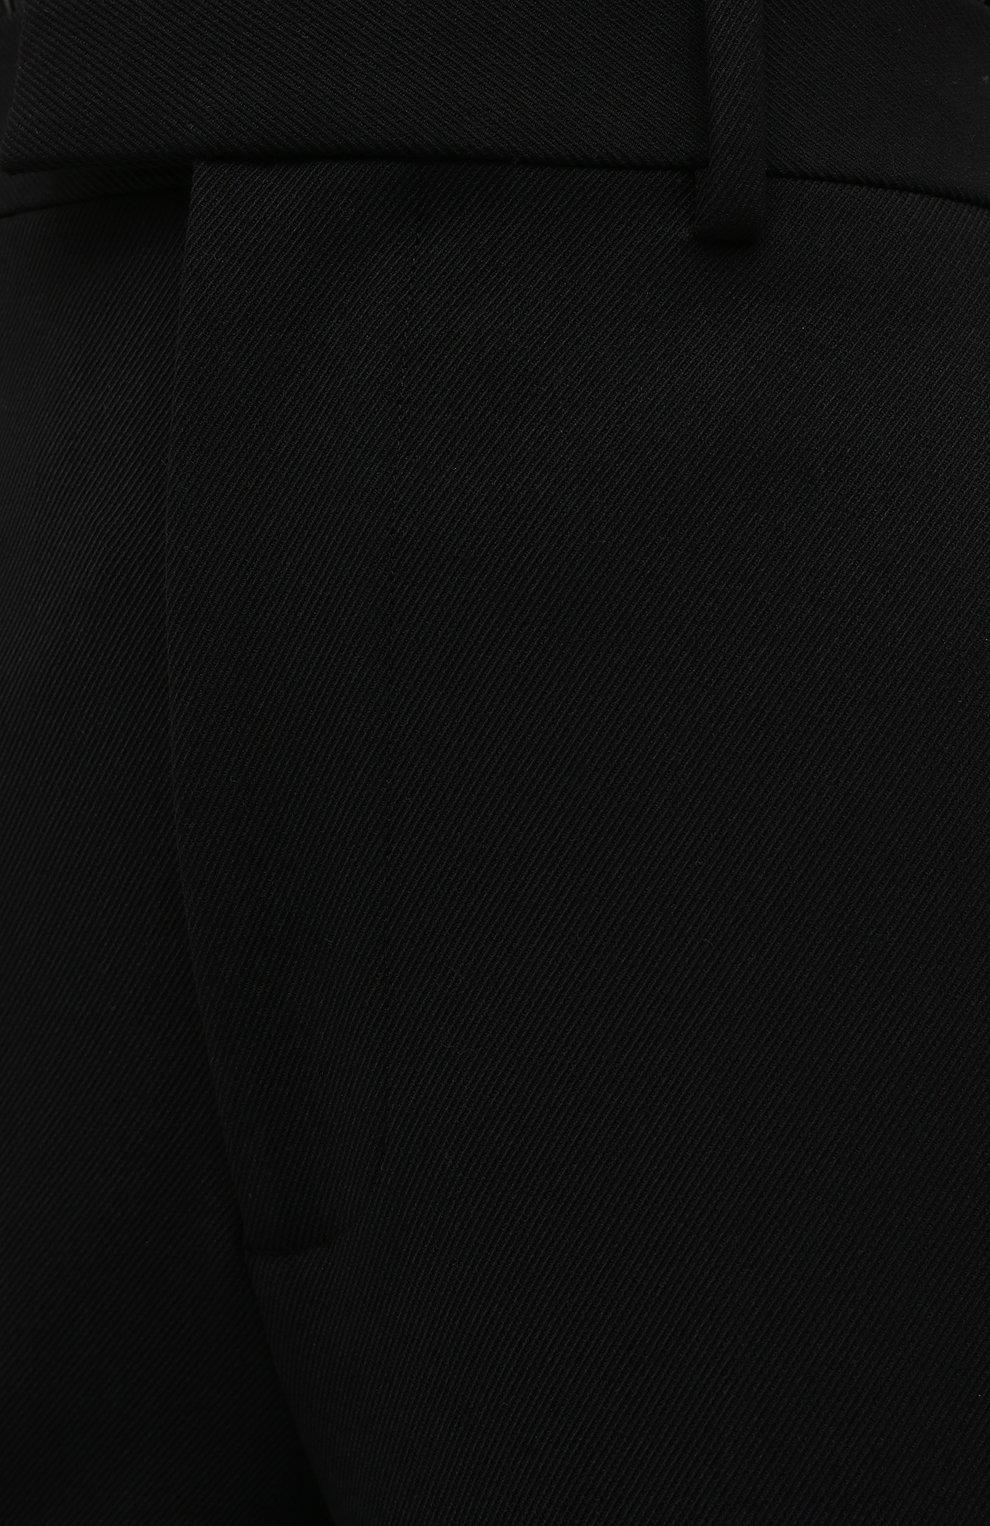 Женские брюки BOTTEGA VENETA черного цвета, арт. 636529/V02W0 | Фото 6